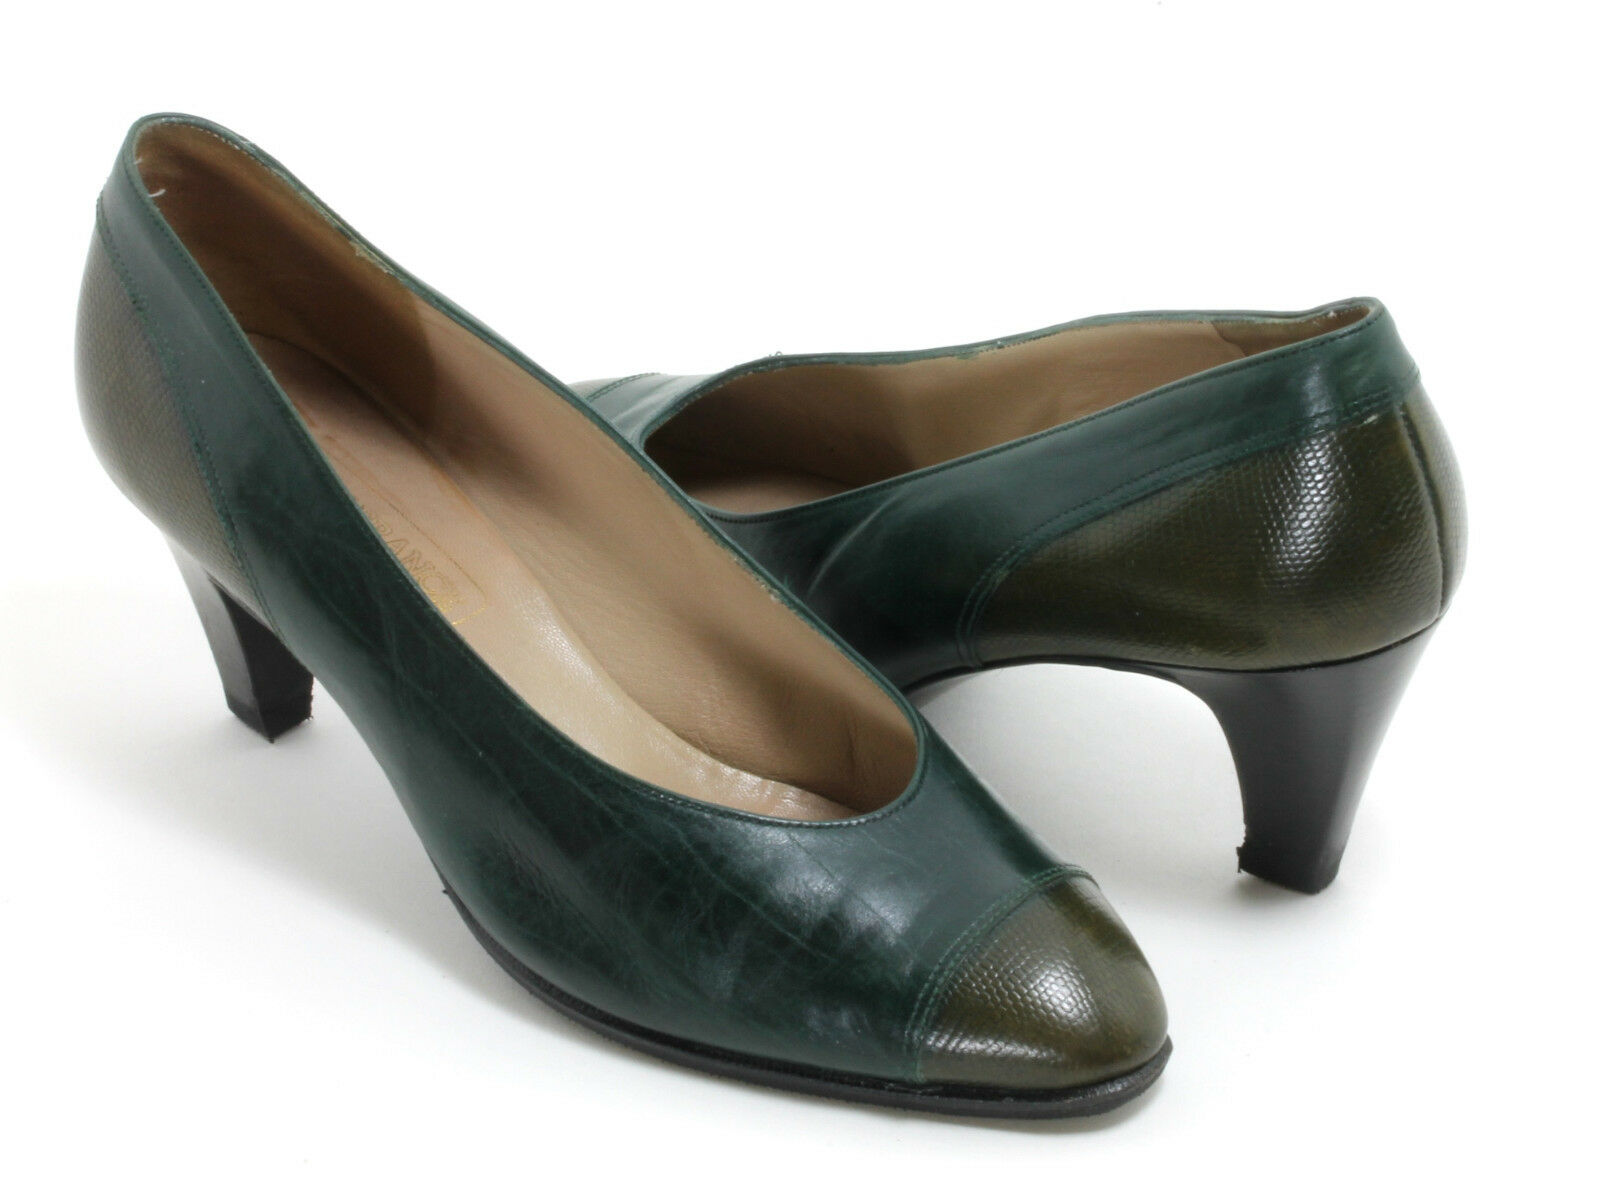 Elegant Vintage Escarpins chaussures femmes chaussures Basses BALLY FRANCE RIVOLI vert pétrole 38